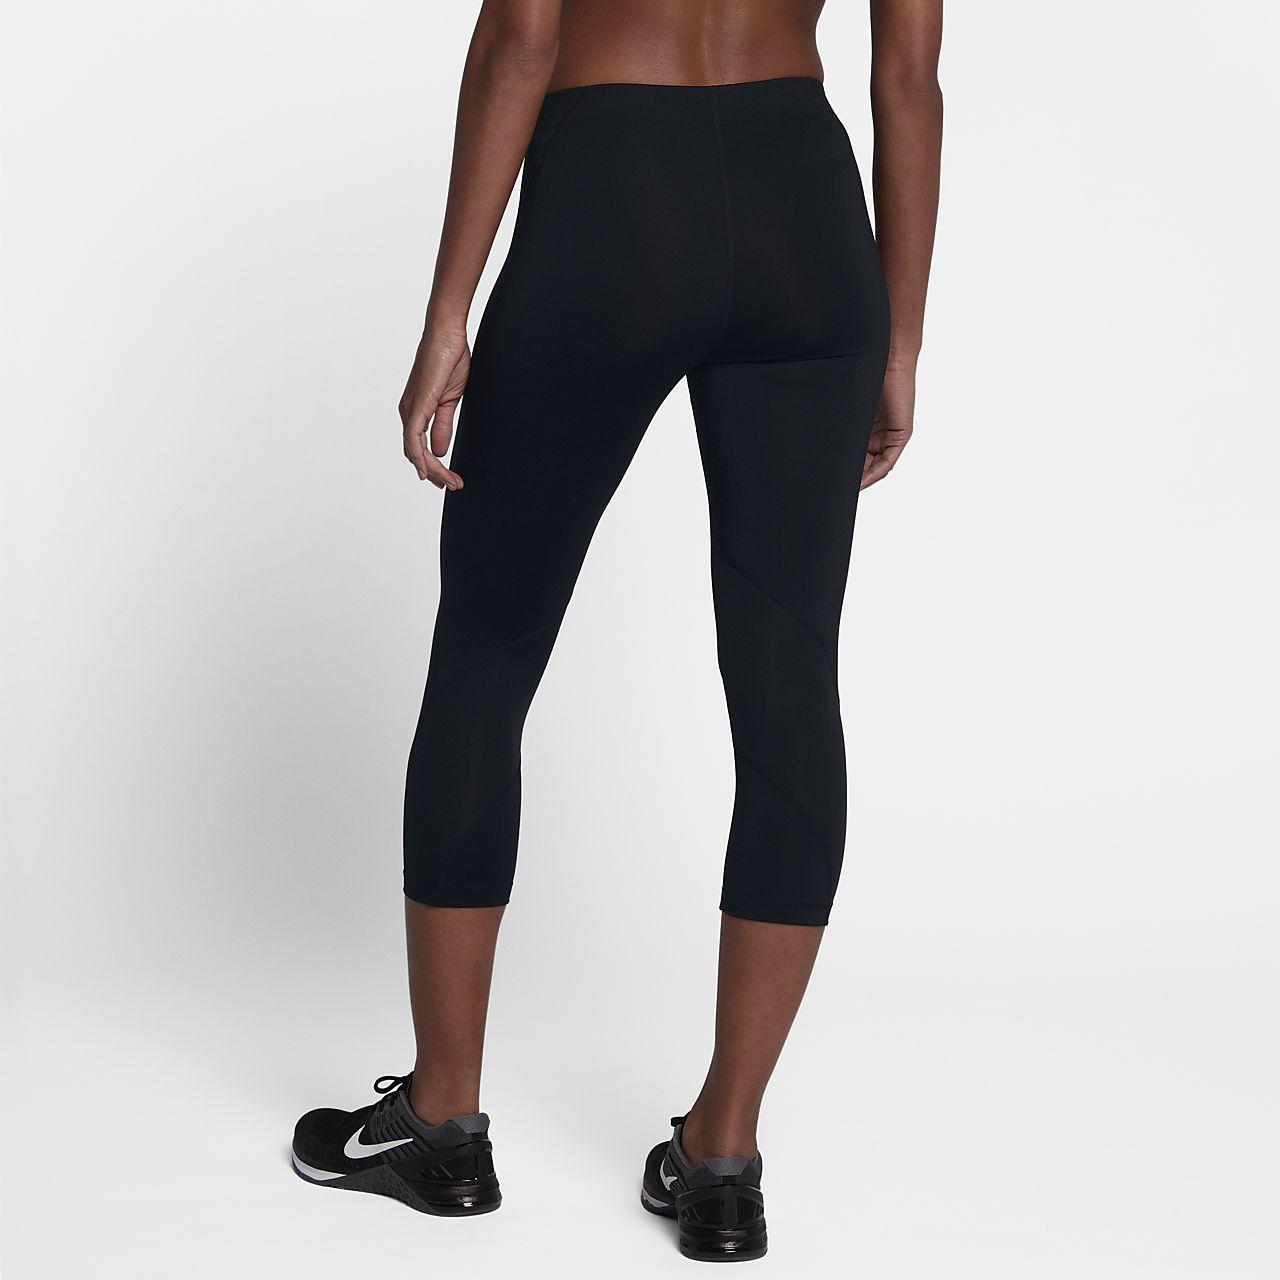 ... Nike Pro Women's Training Capris